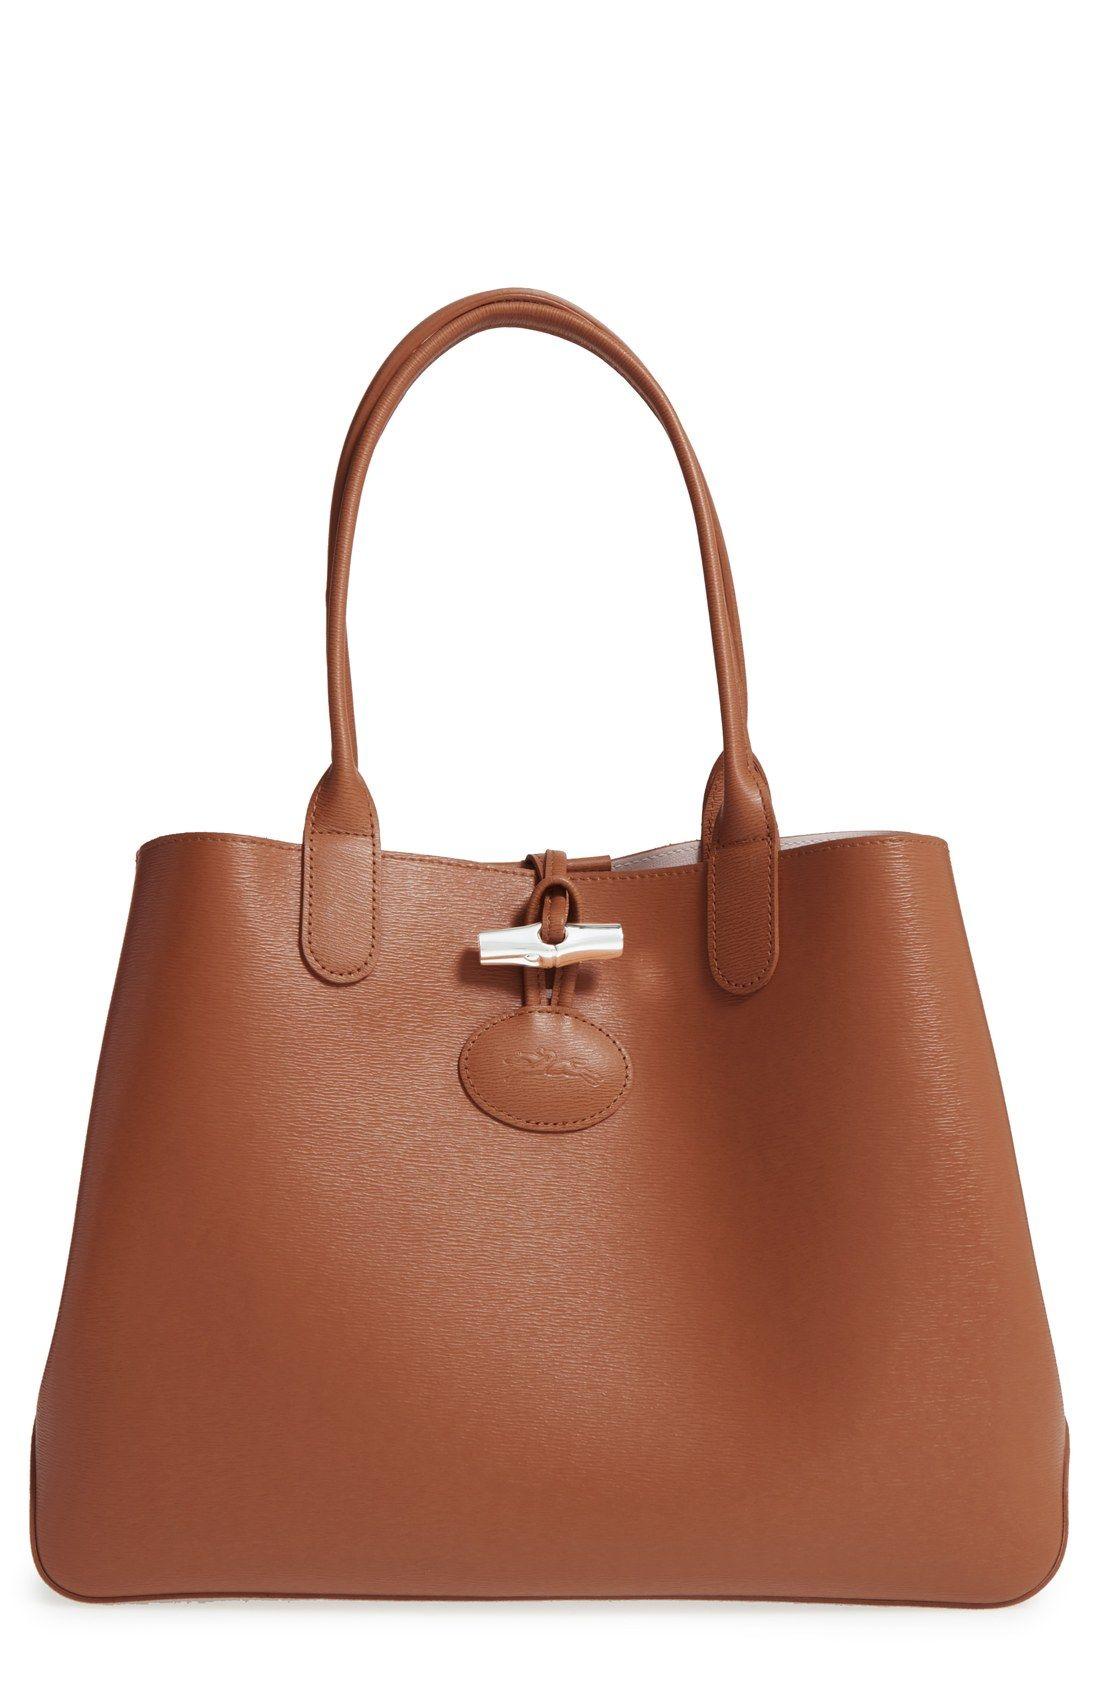 Longchamp  Roseau  Reversible Leather Tote  23c34e37292cb